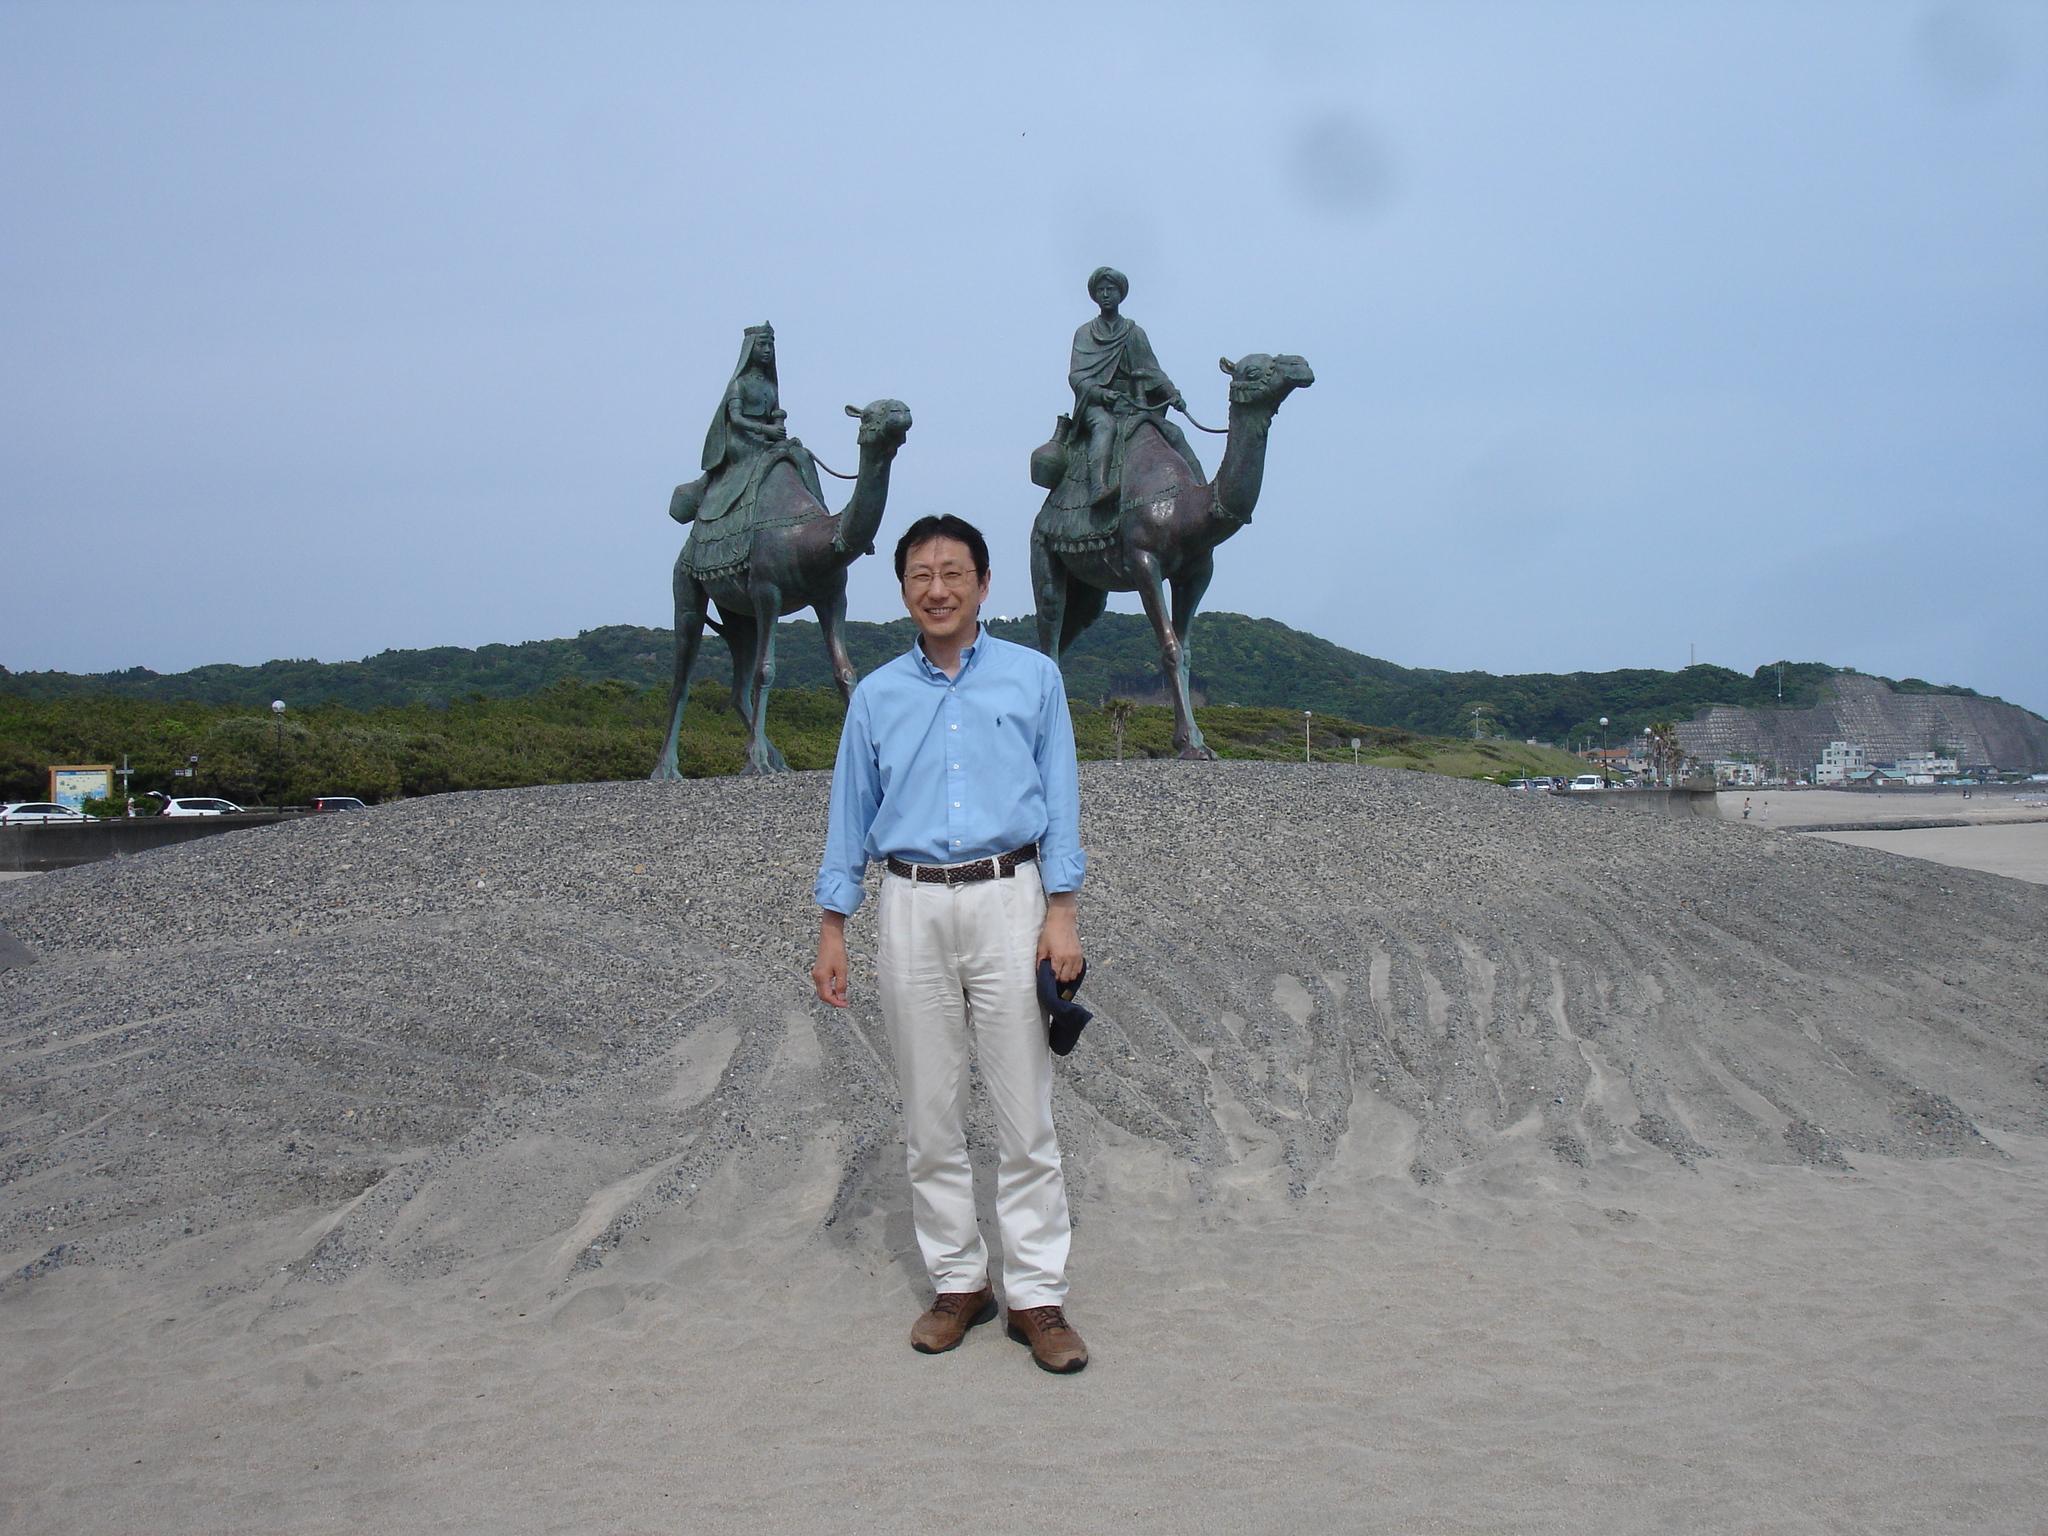 http://www.aqu-aca.com/masblog/DSC03462.JPG